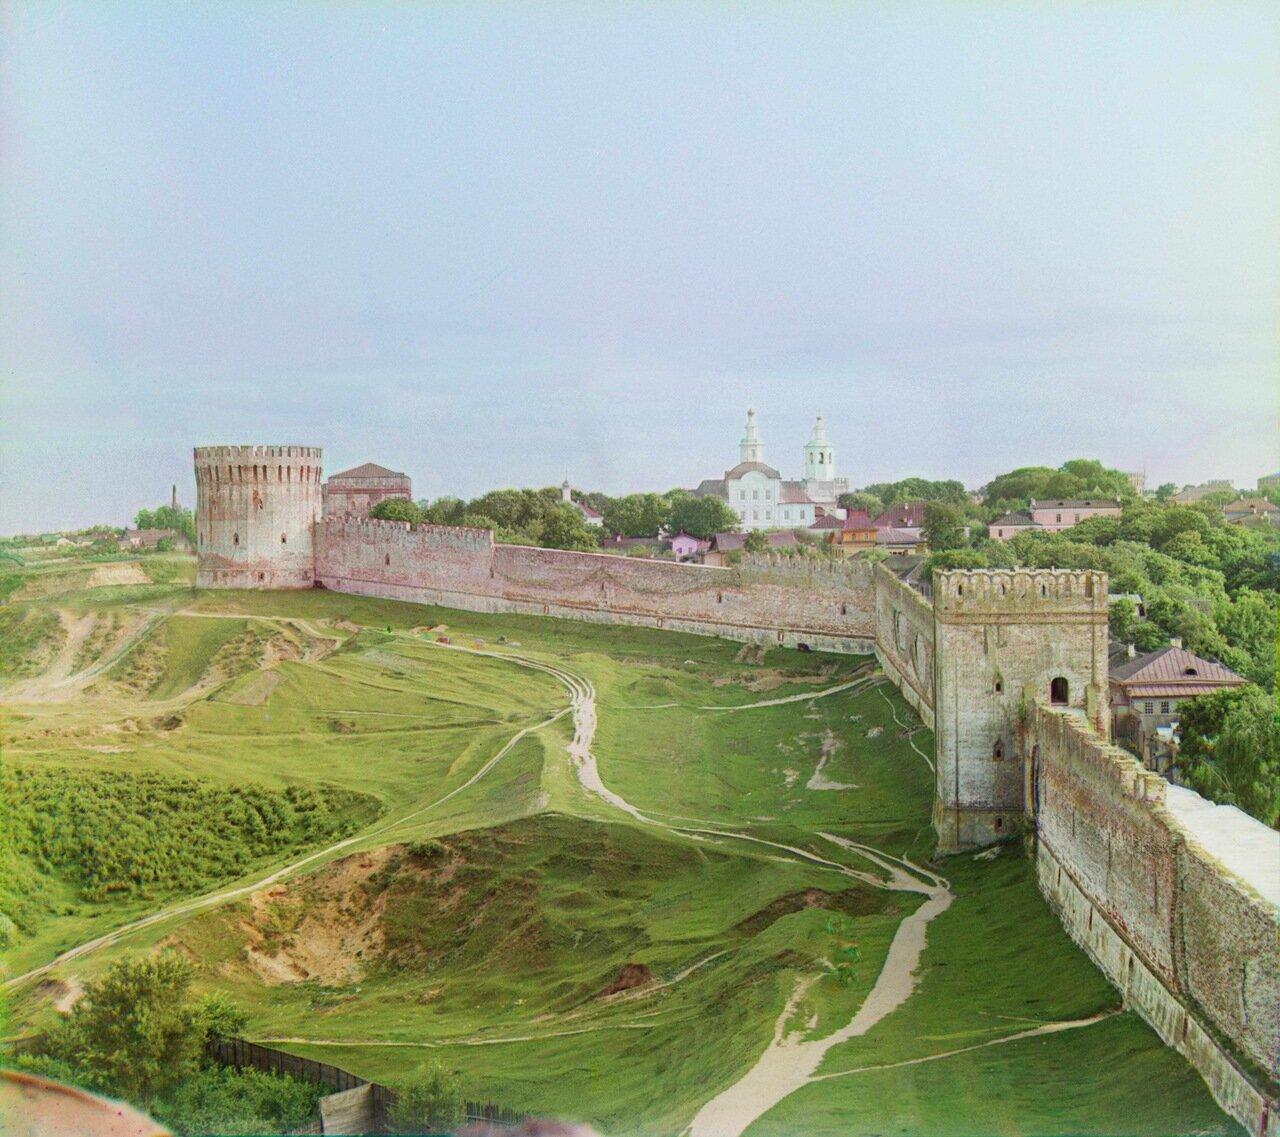 Вид на крепостную стену с башни Веселуха